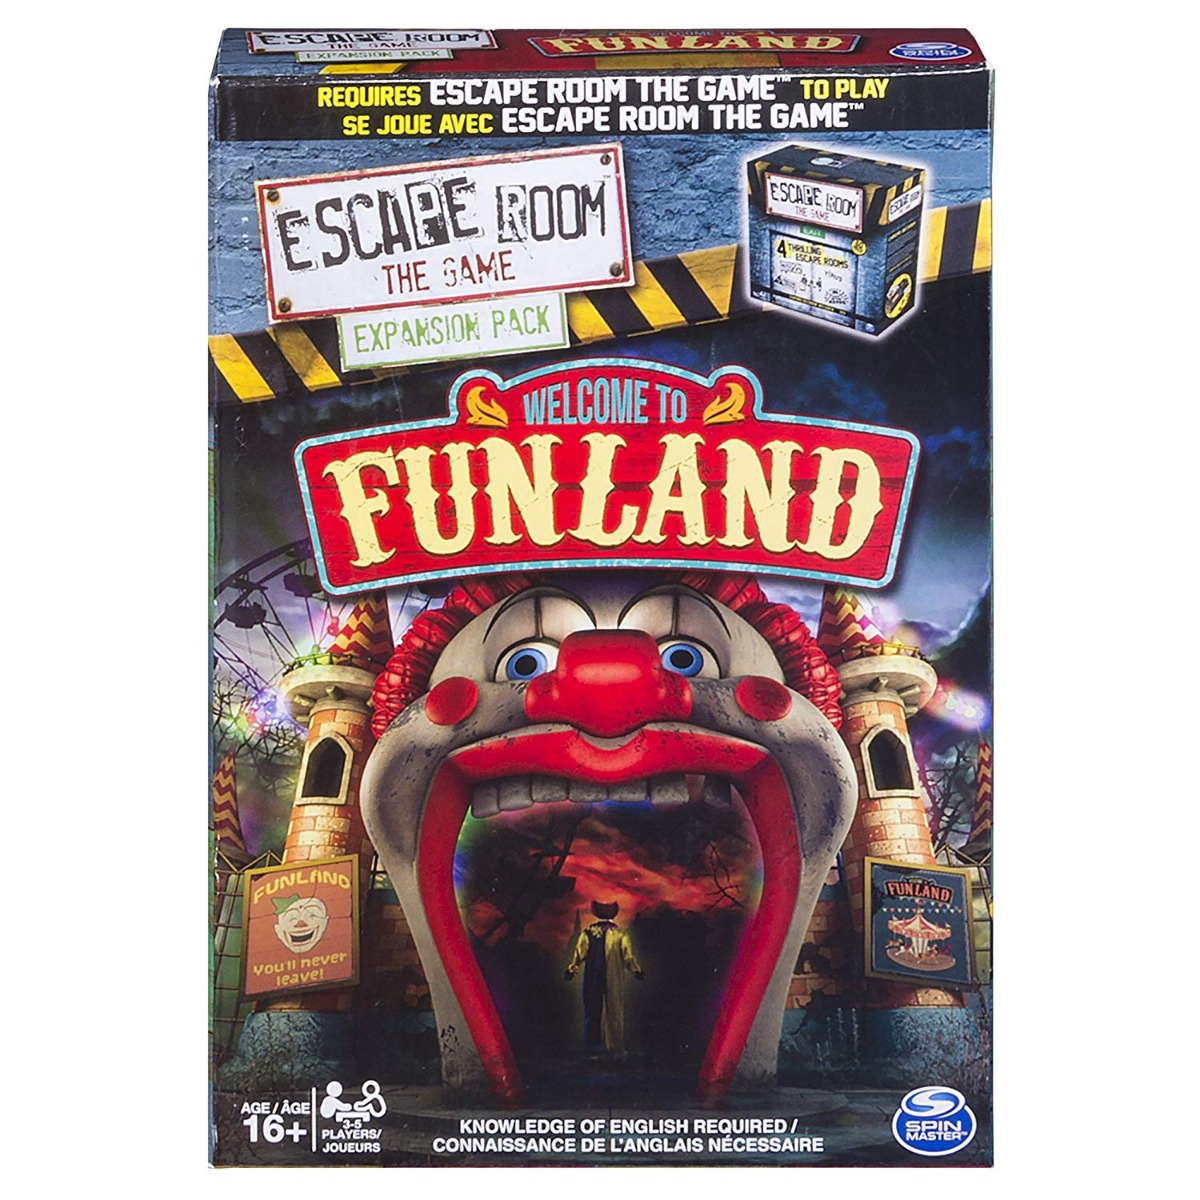 Joc de societate Escape Room Extension Pack Funland